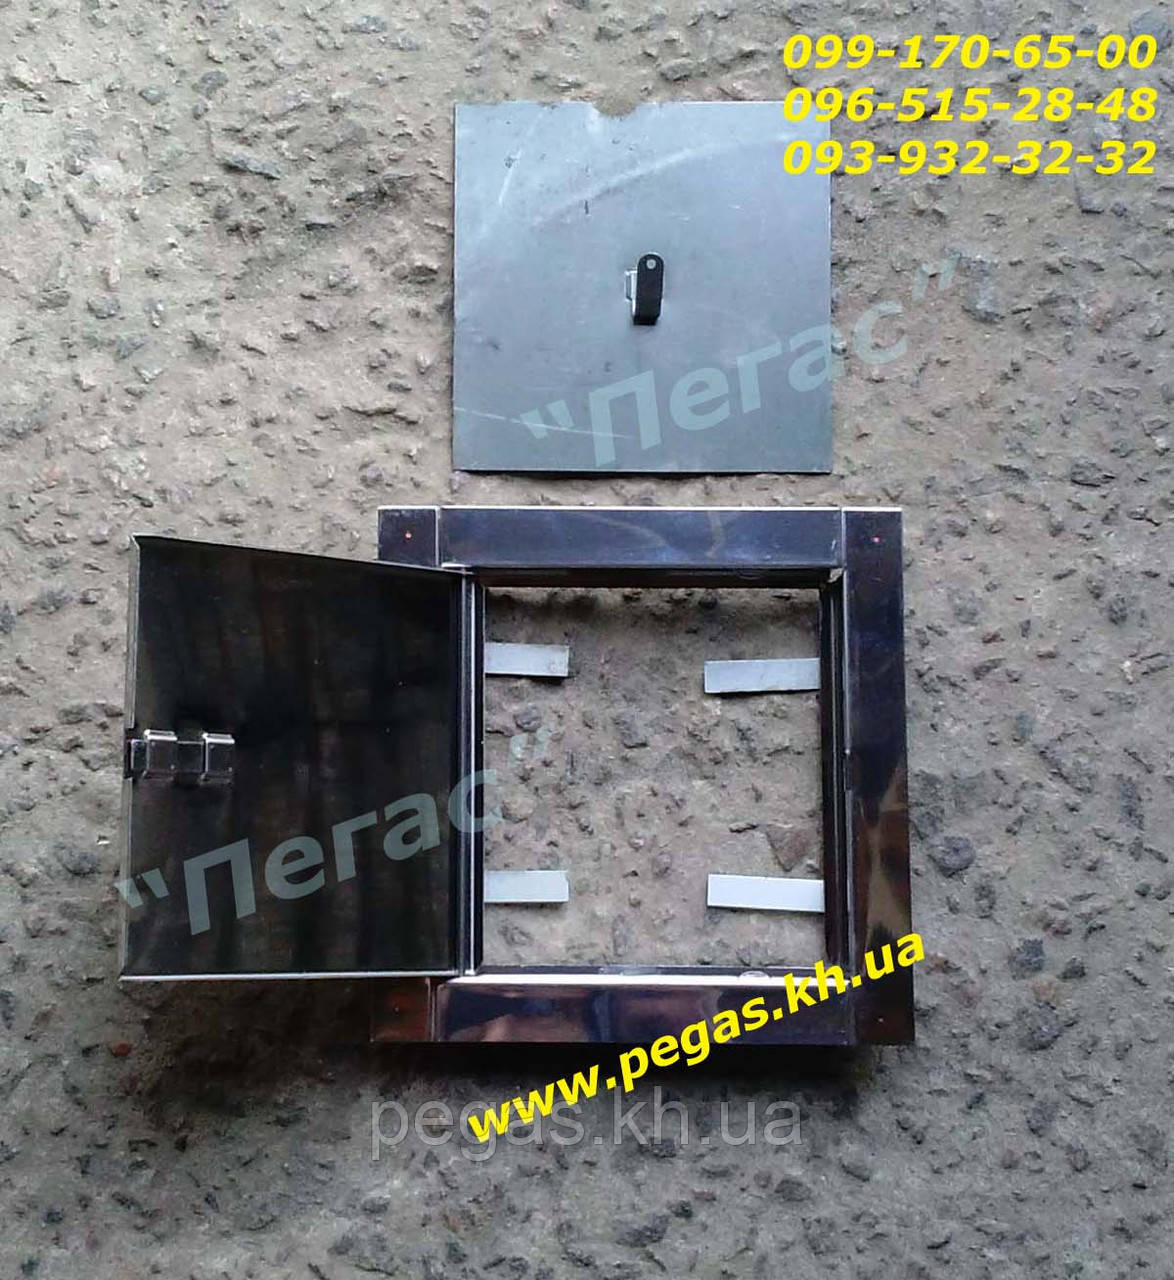 Дверца сажетруска прочистная нержавейка 140х140 мм. люк для золы, сажечистка